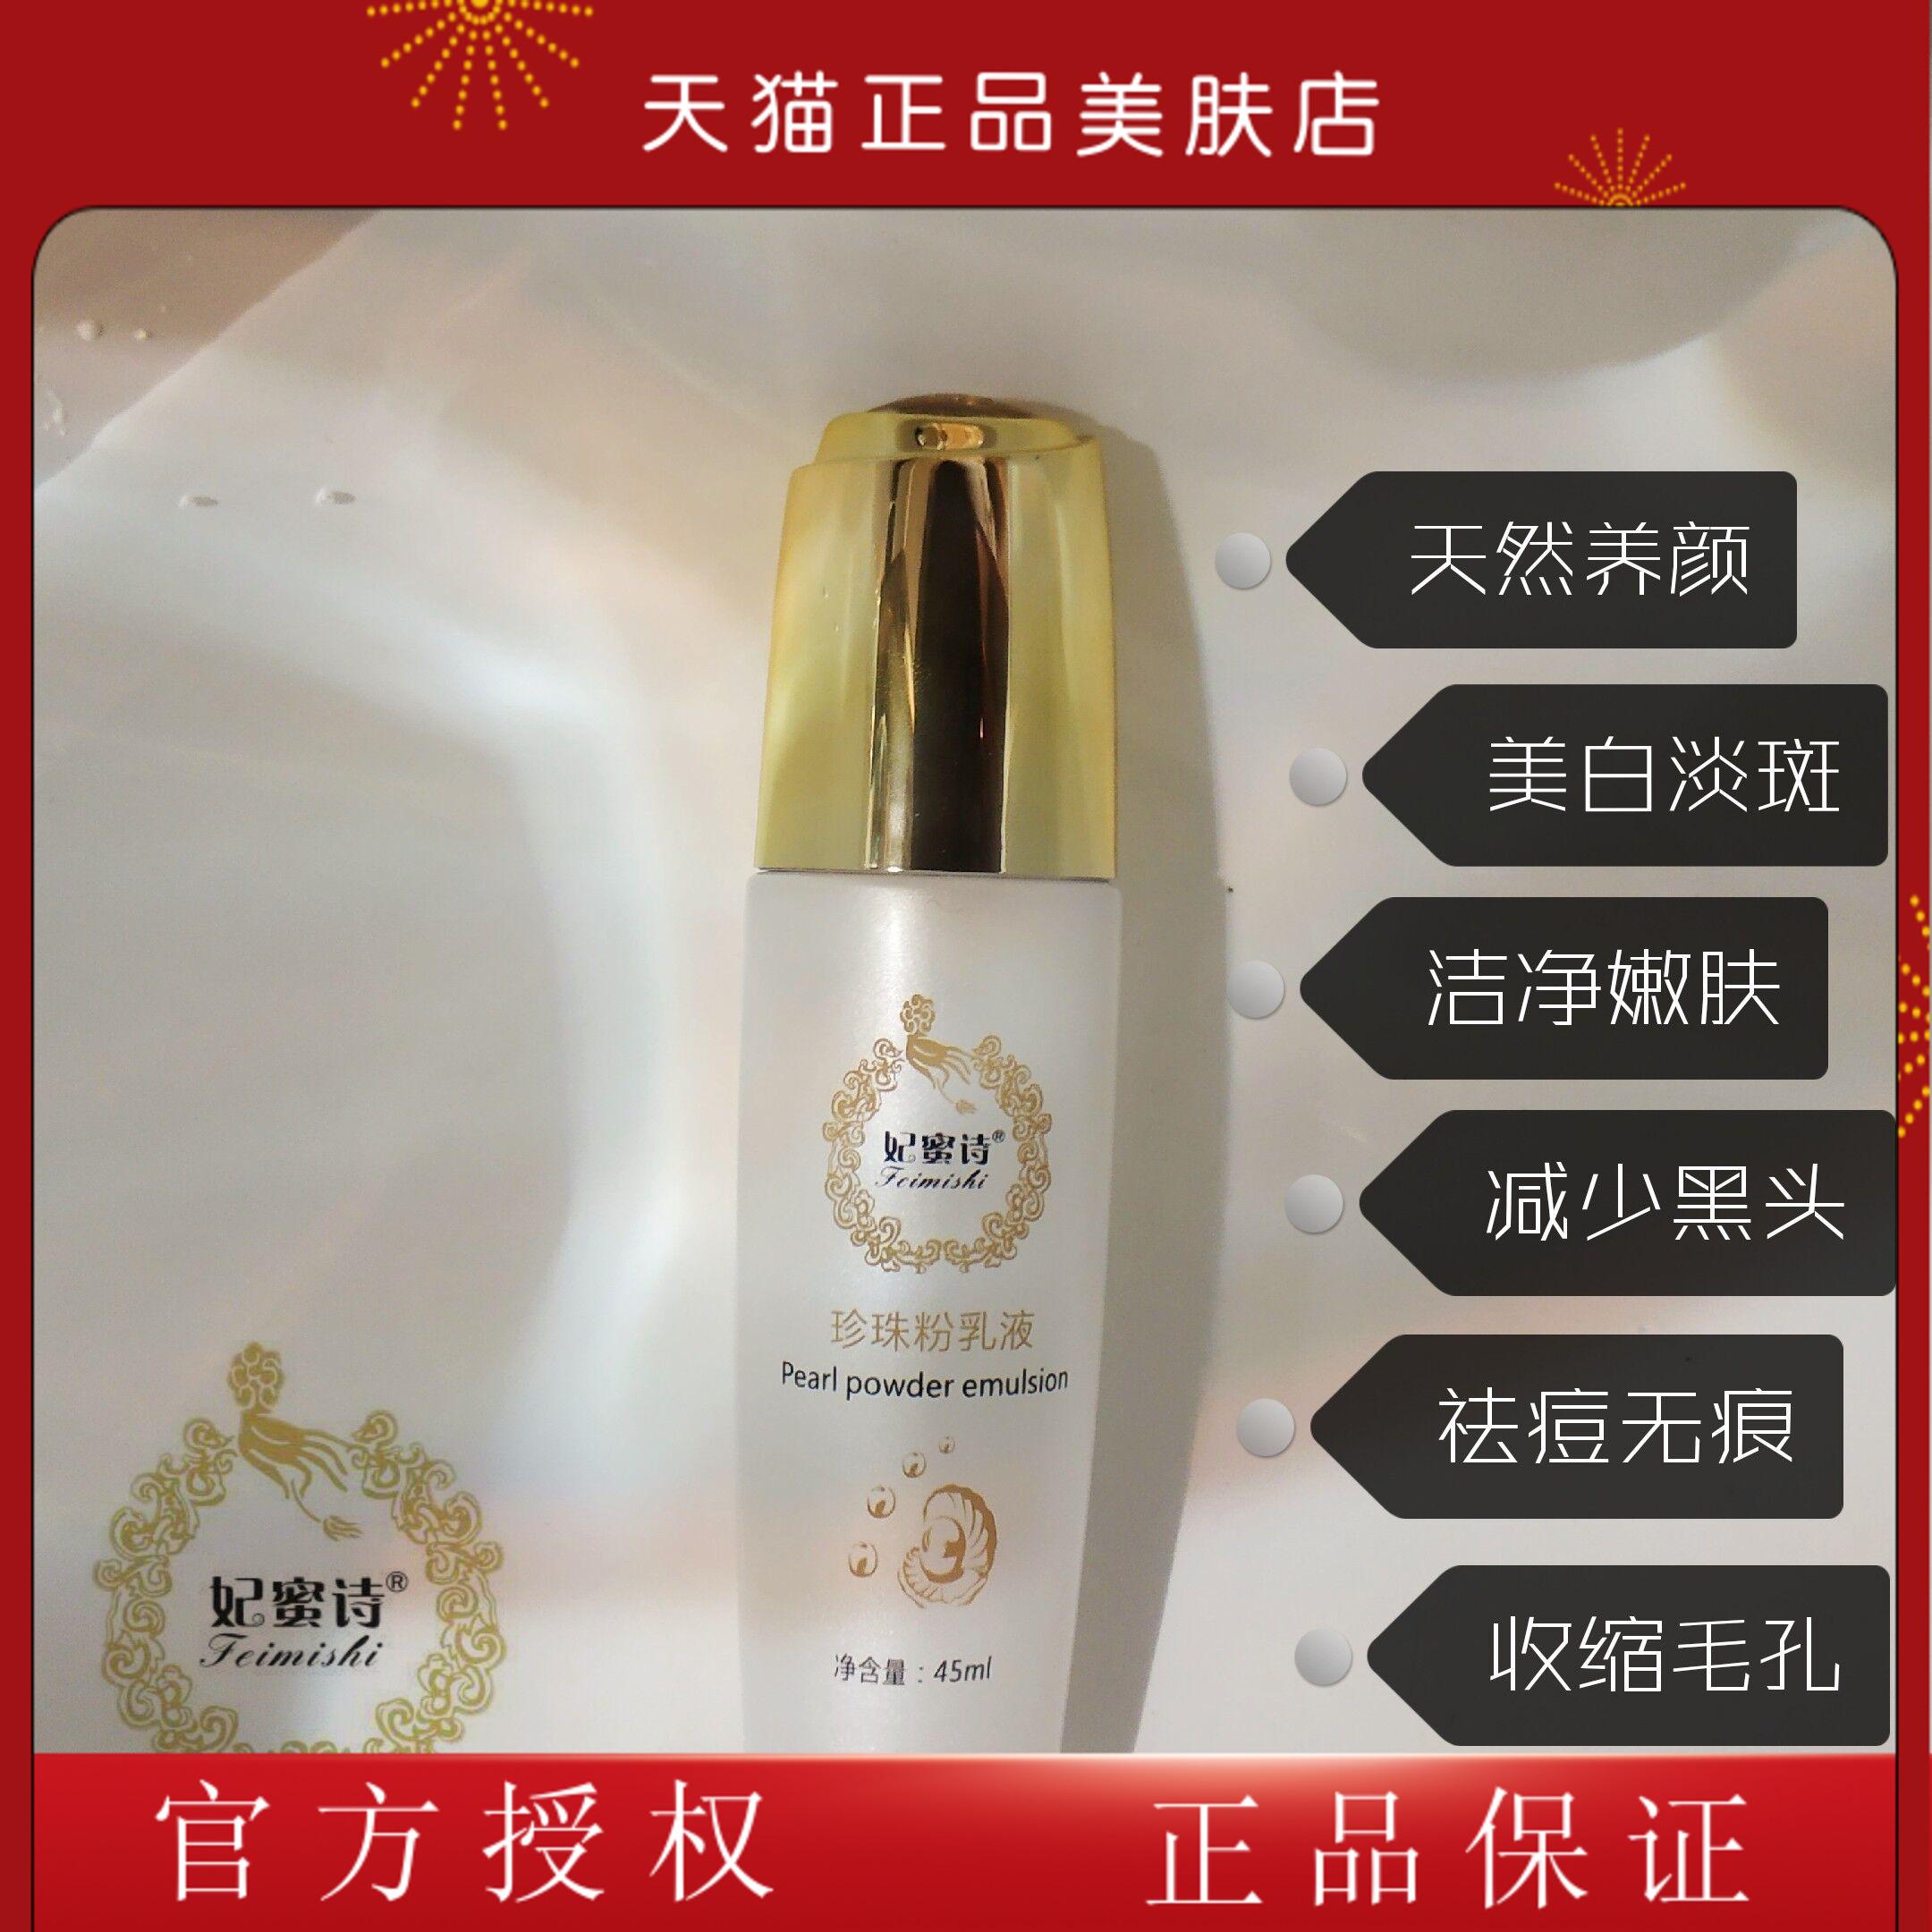 Genuine Honey Powder, pearl powder emulsion, anti acne spot, sunscreen, isolation, brightening, skin tone, skin whitening, moisturizing, skin moisturizing, skin moistening, and moisturizing.